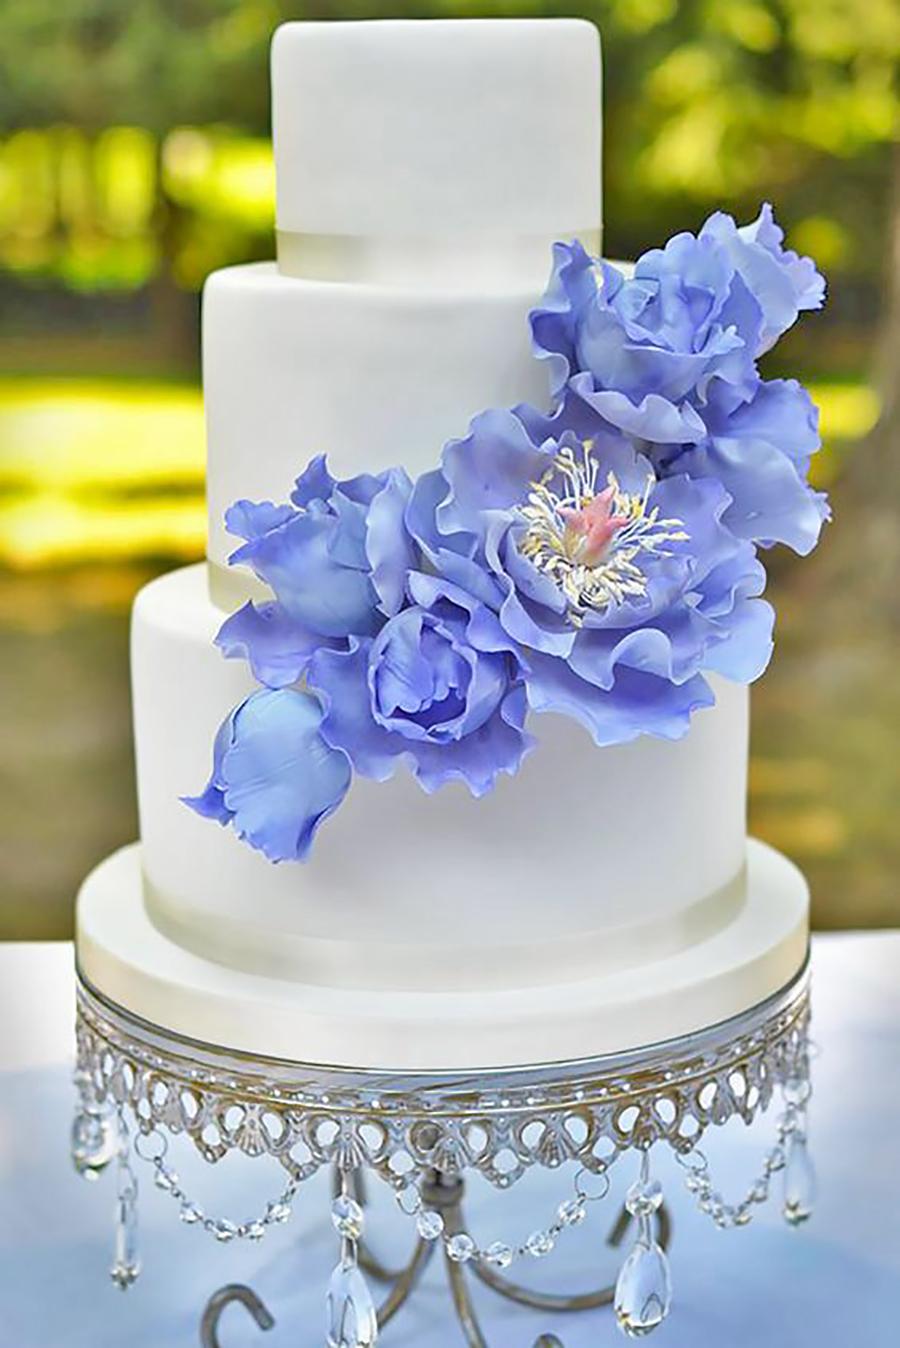 but a dream cakes opulnet treasures cakestand.jpg